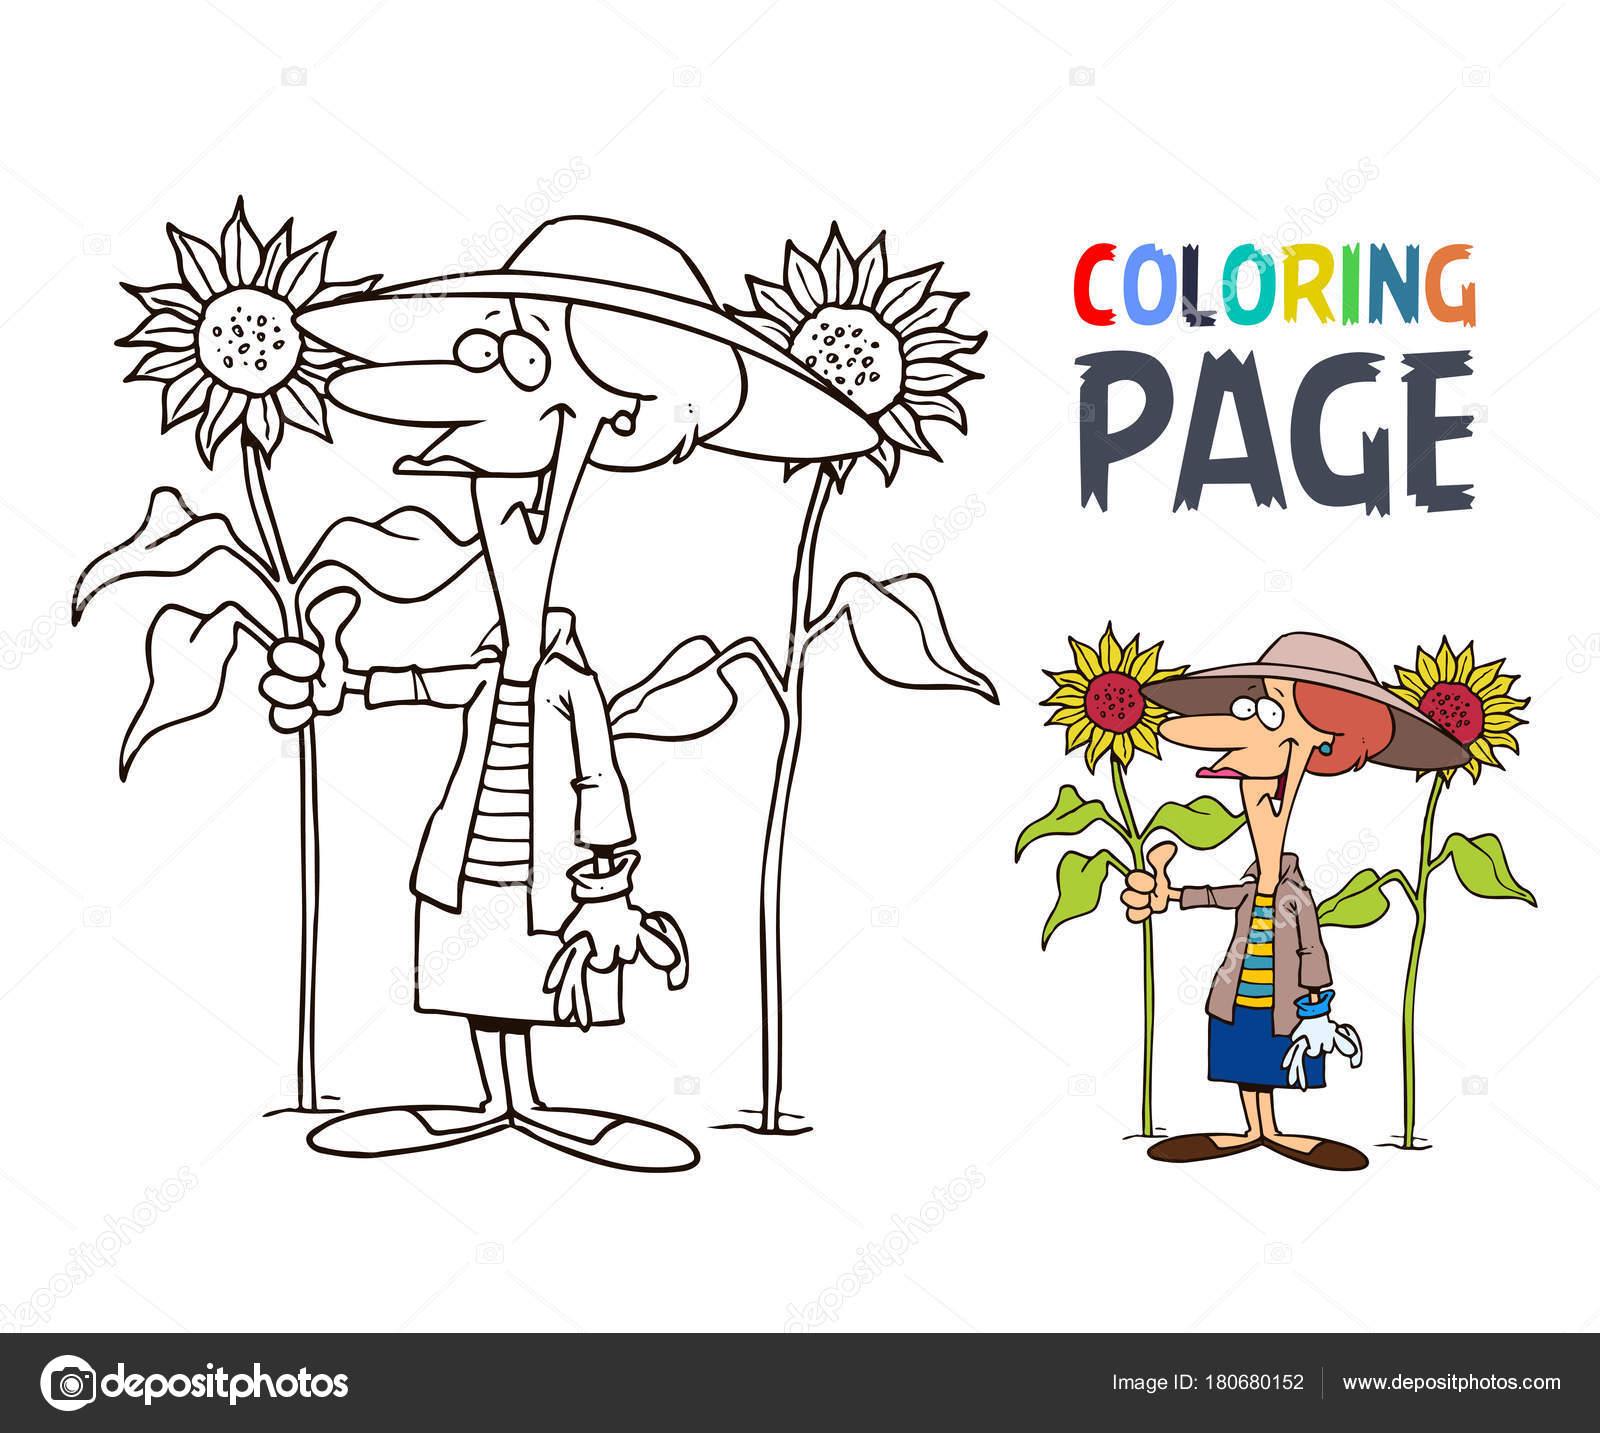 Kleurplaten Over Oma.Oma En Zonnebloem Tekenfilm Kleurplaten Pagina Stockvector